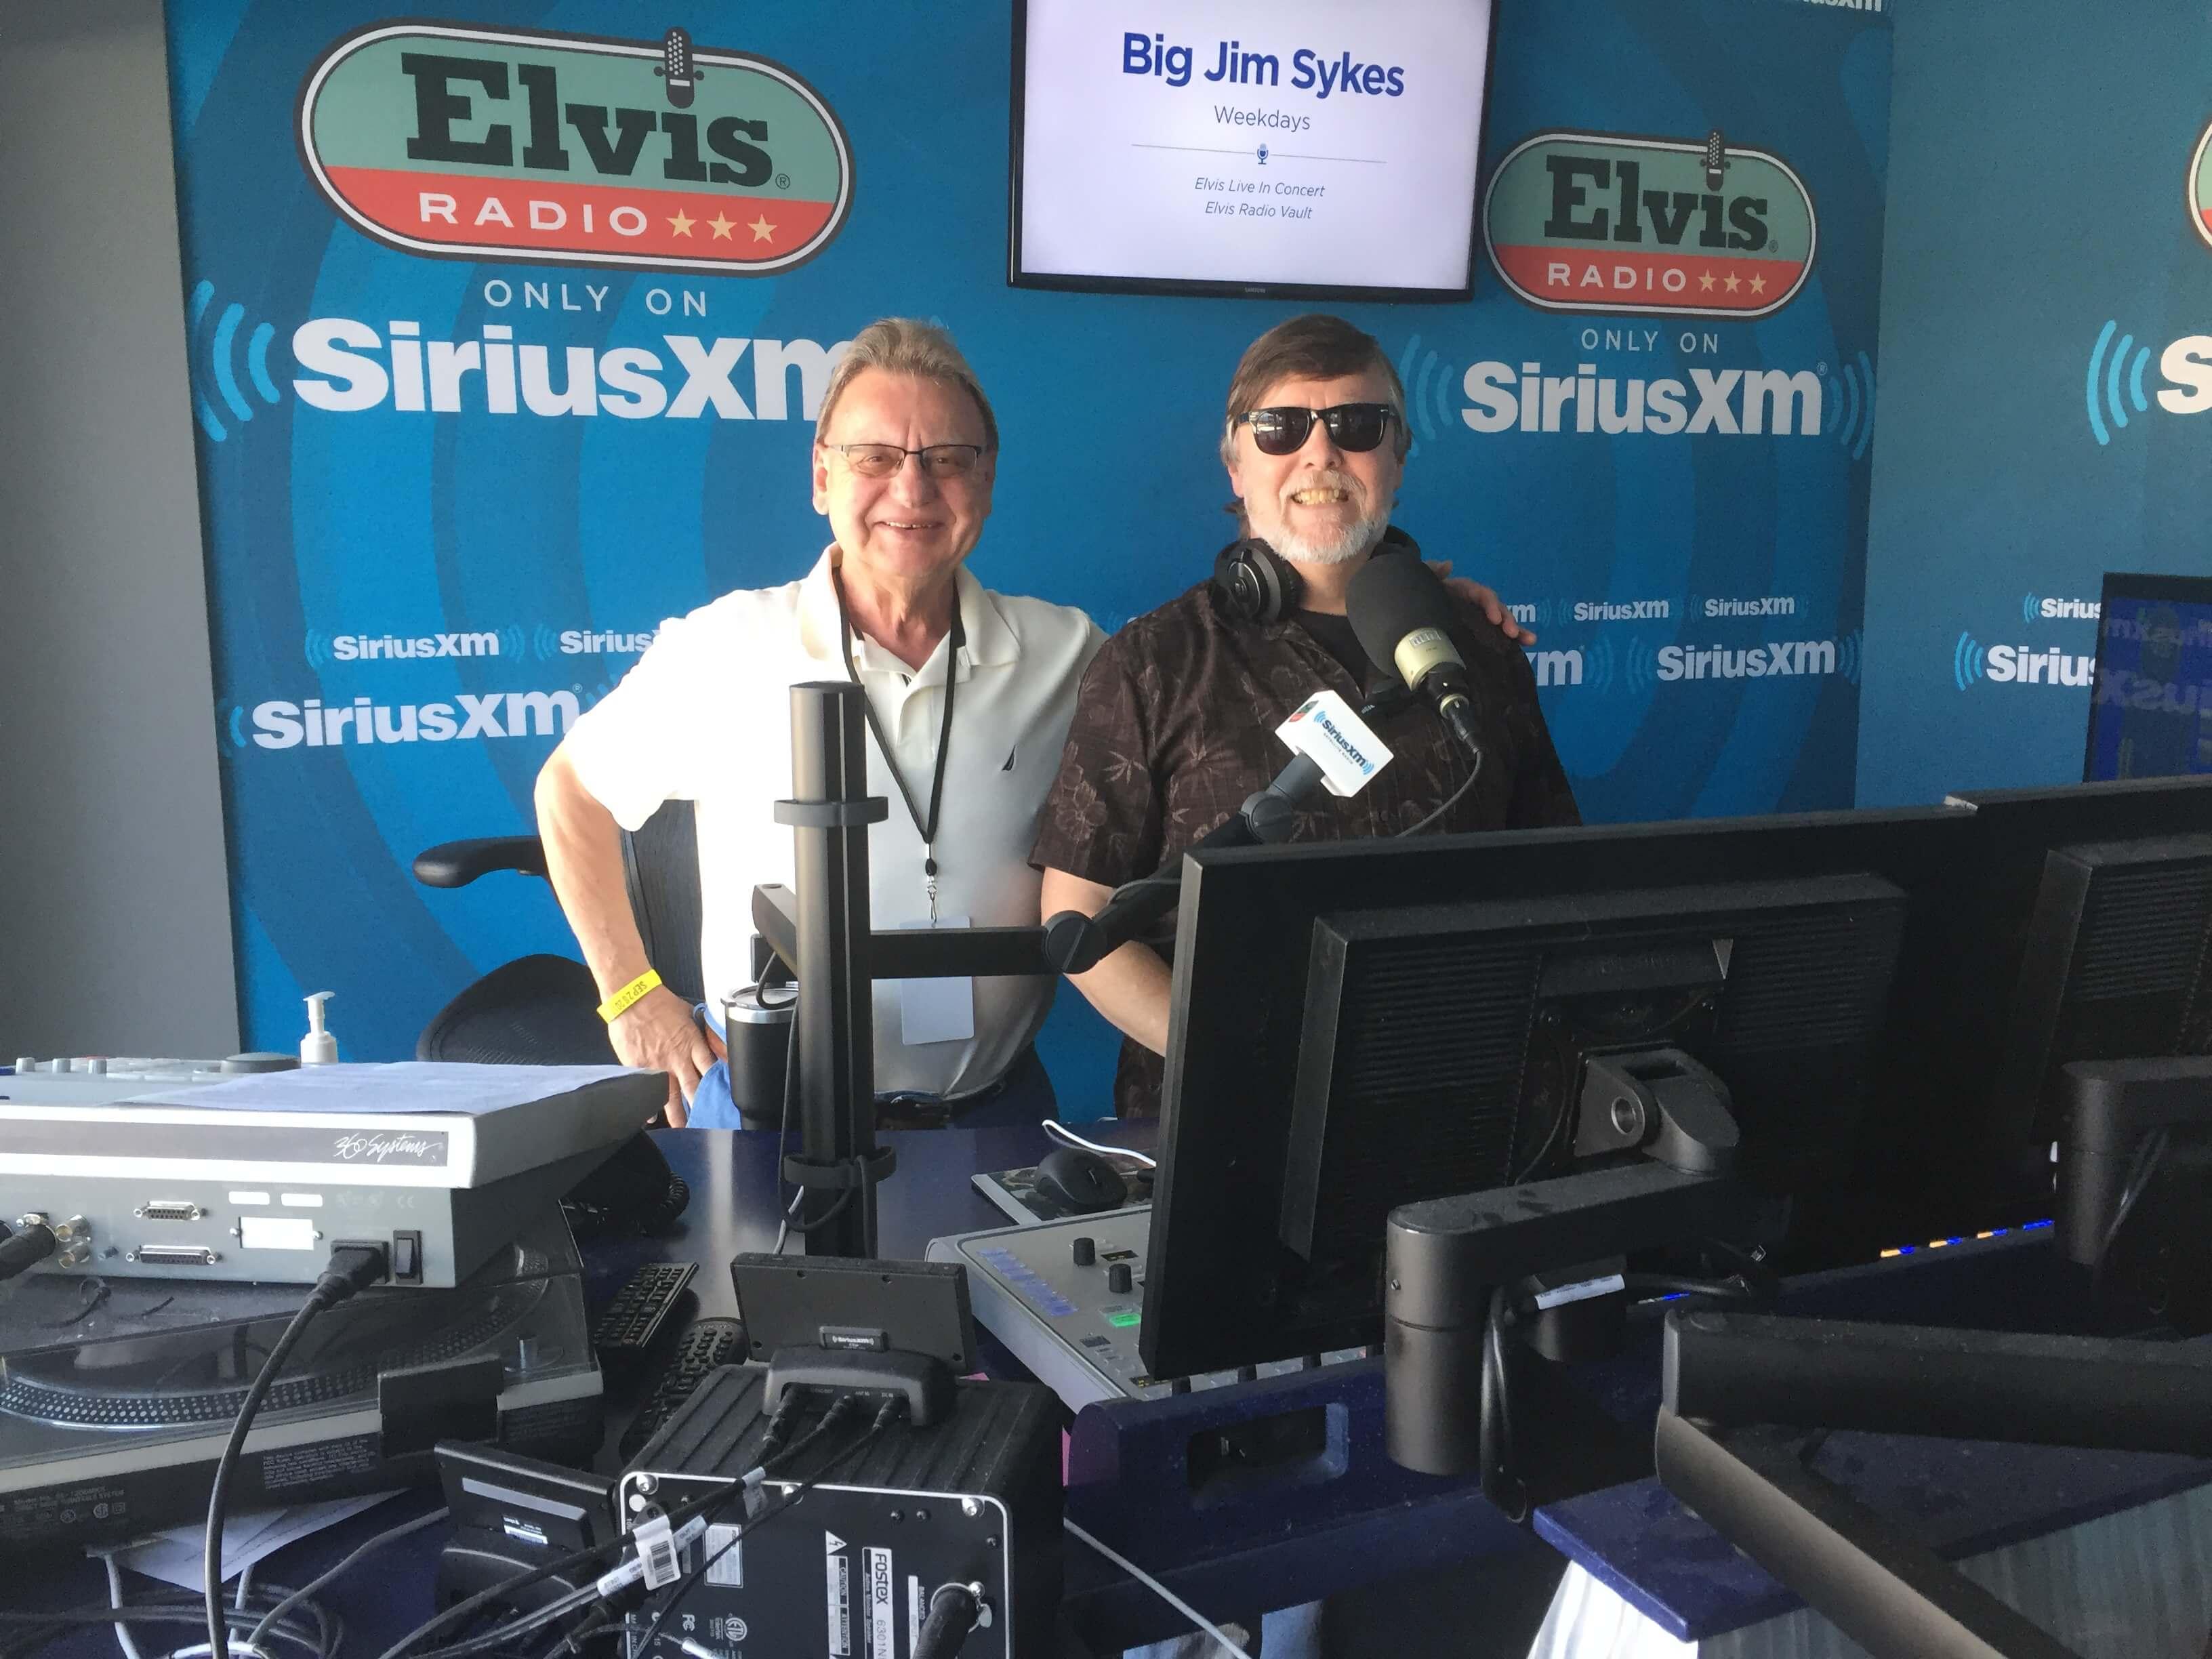 Christian Radio and Tv Broadcasting | RKP RADIO